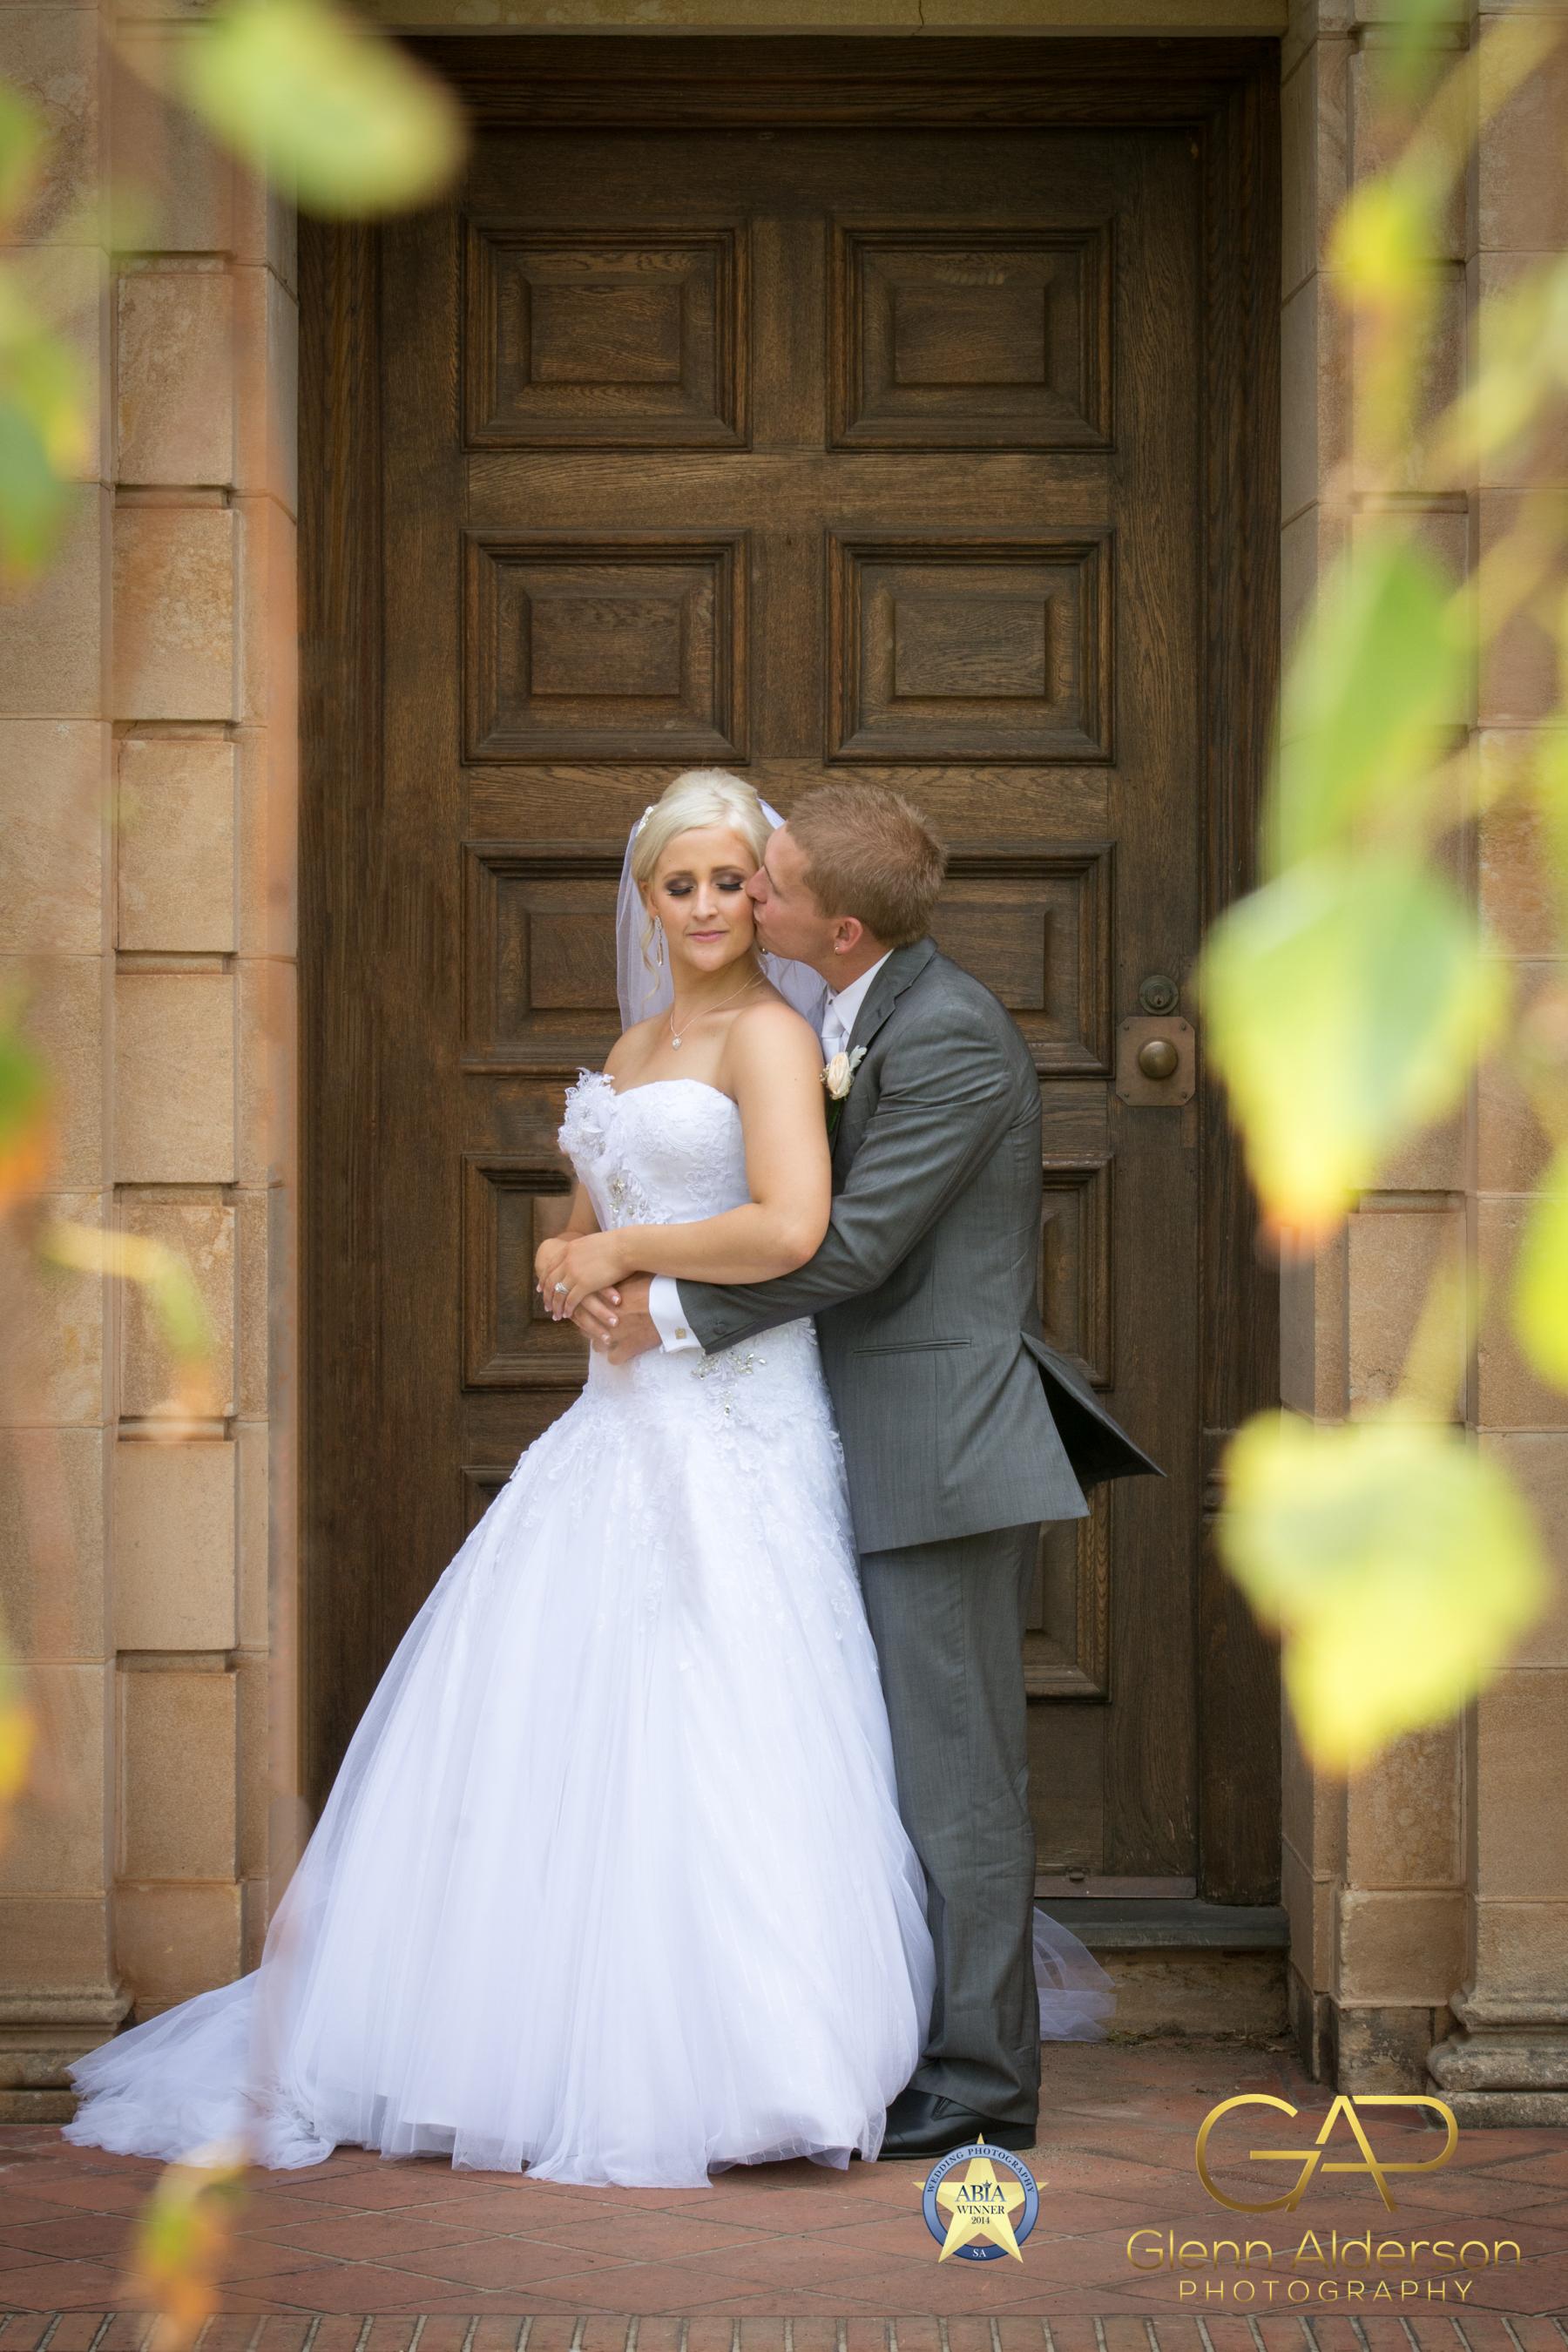 Carrick Hill Wedding - James & Kimberly